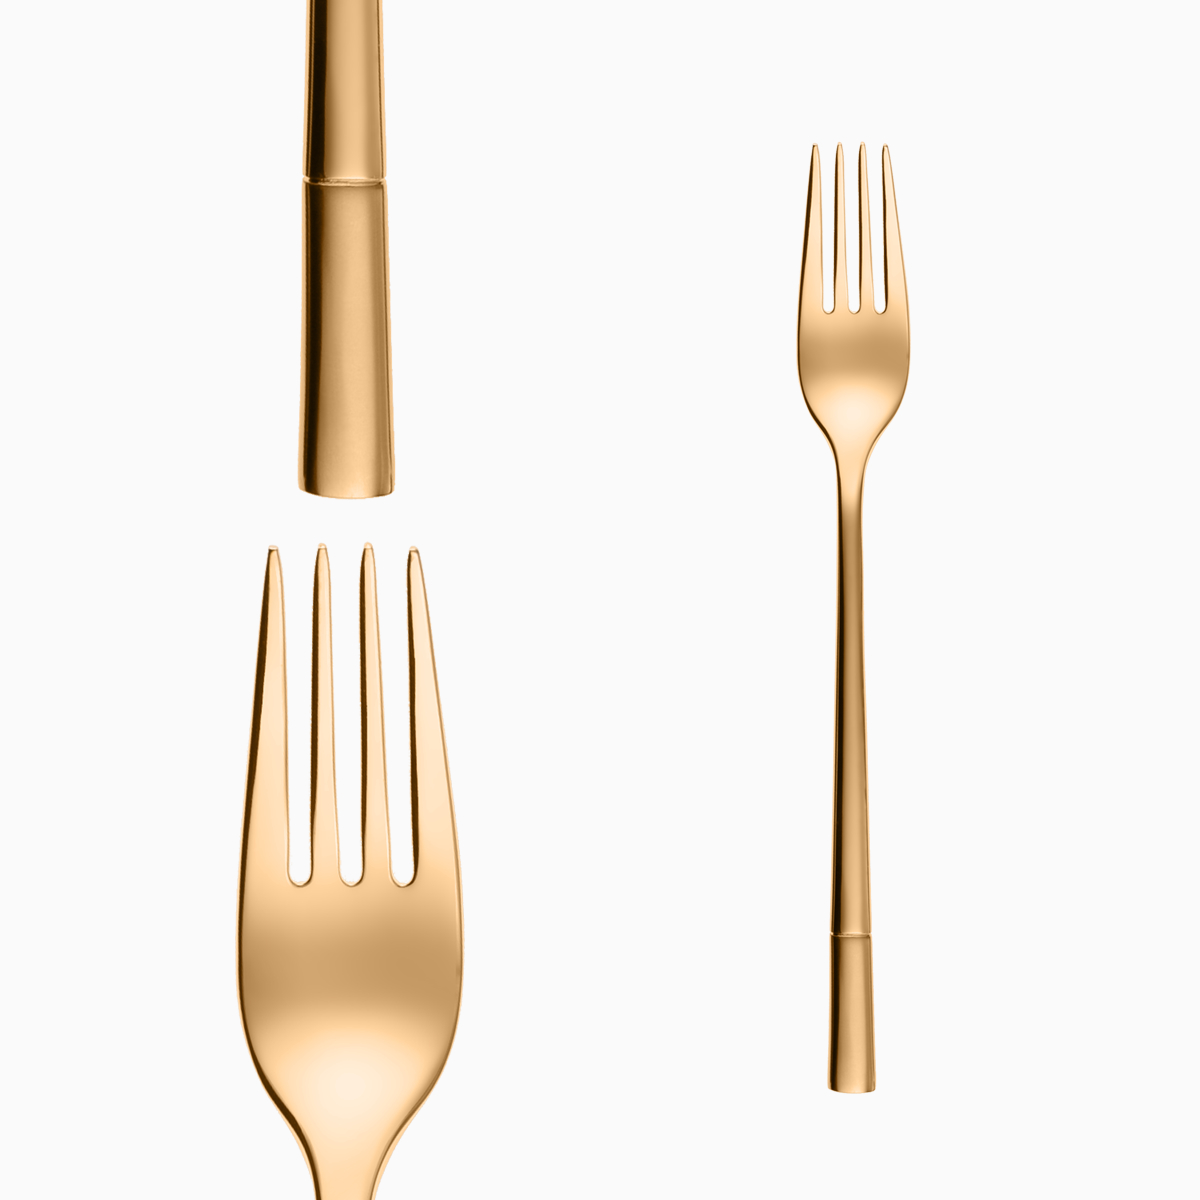 luxus-gold-sandblast-part4